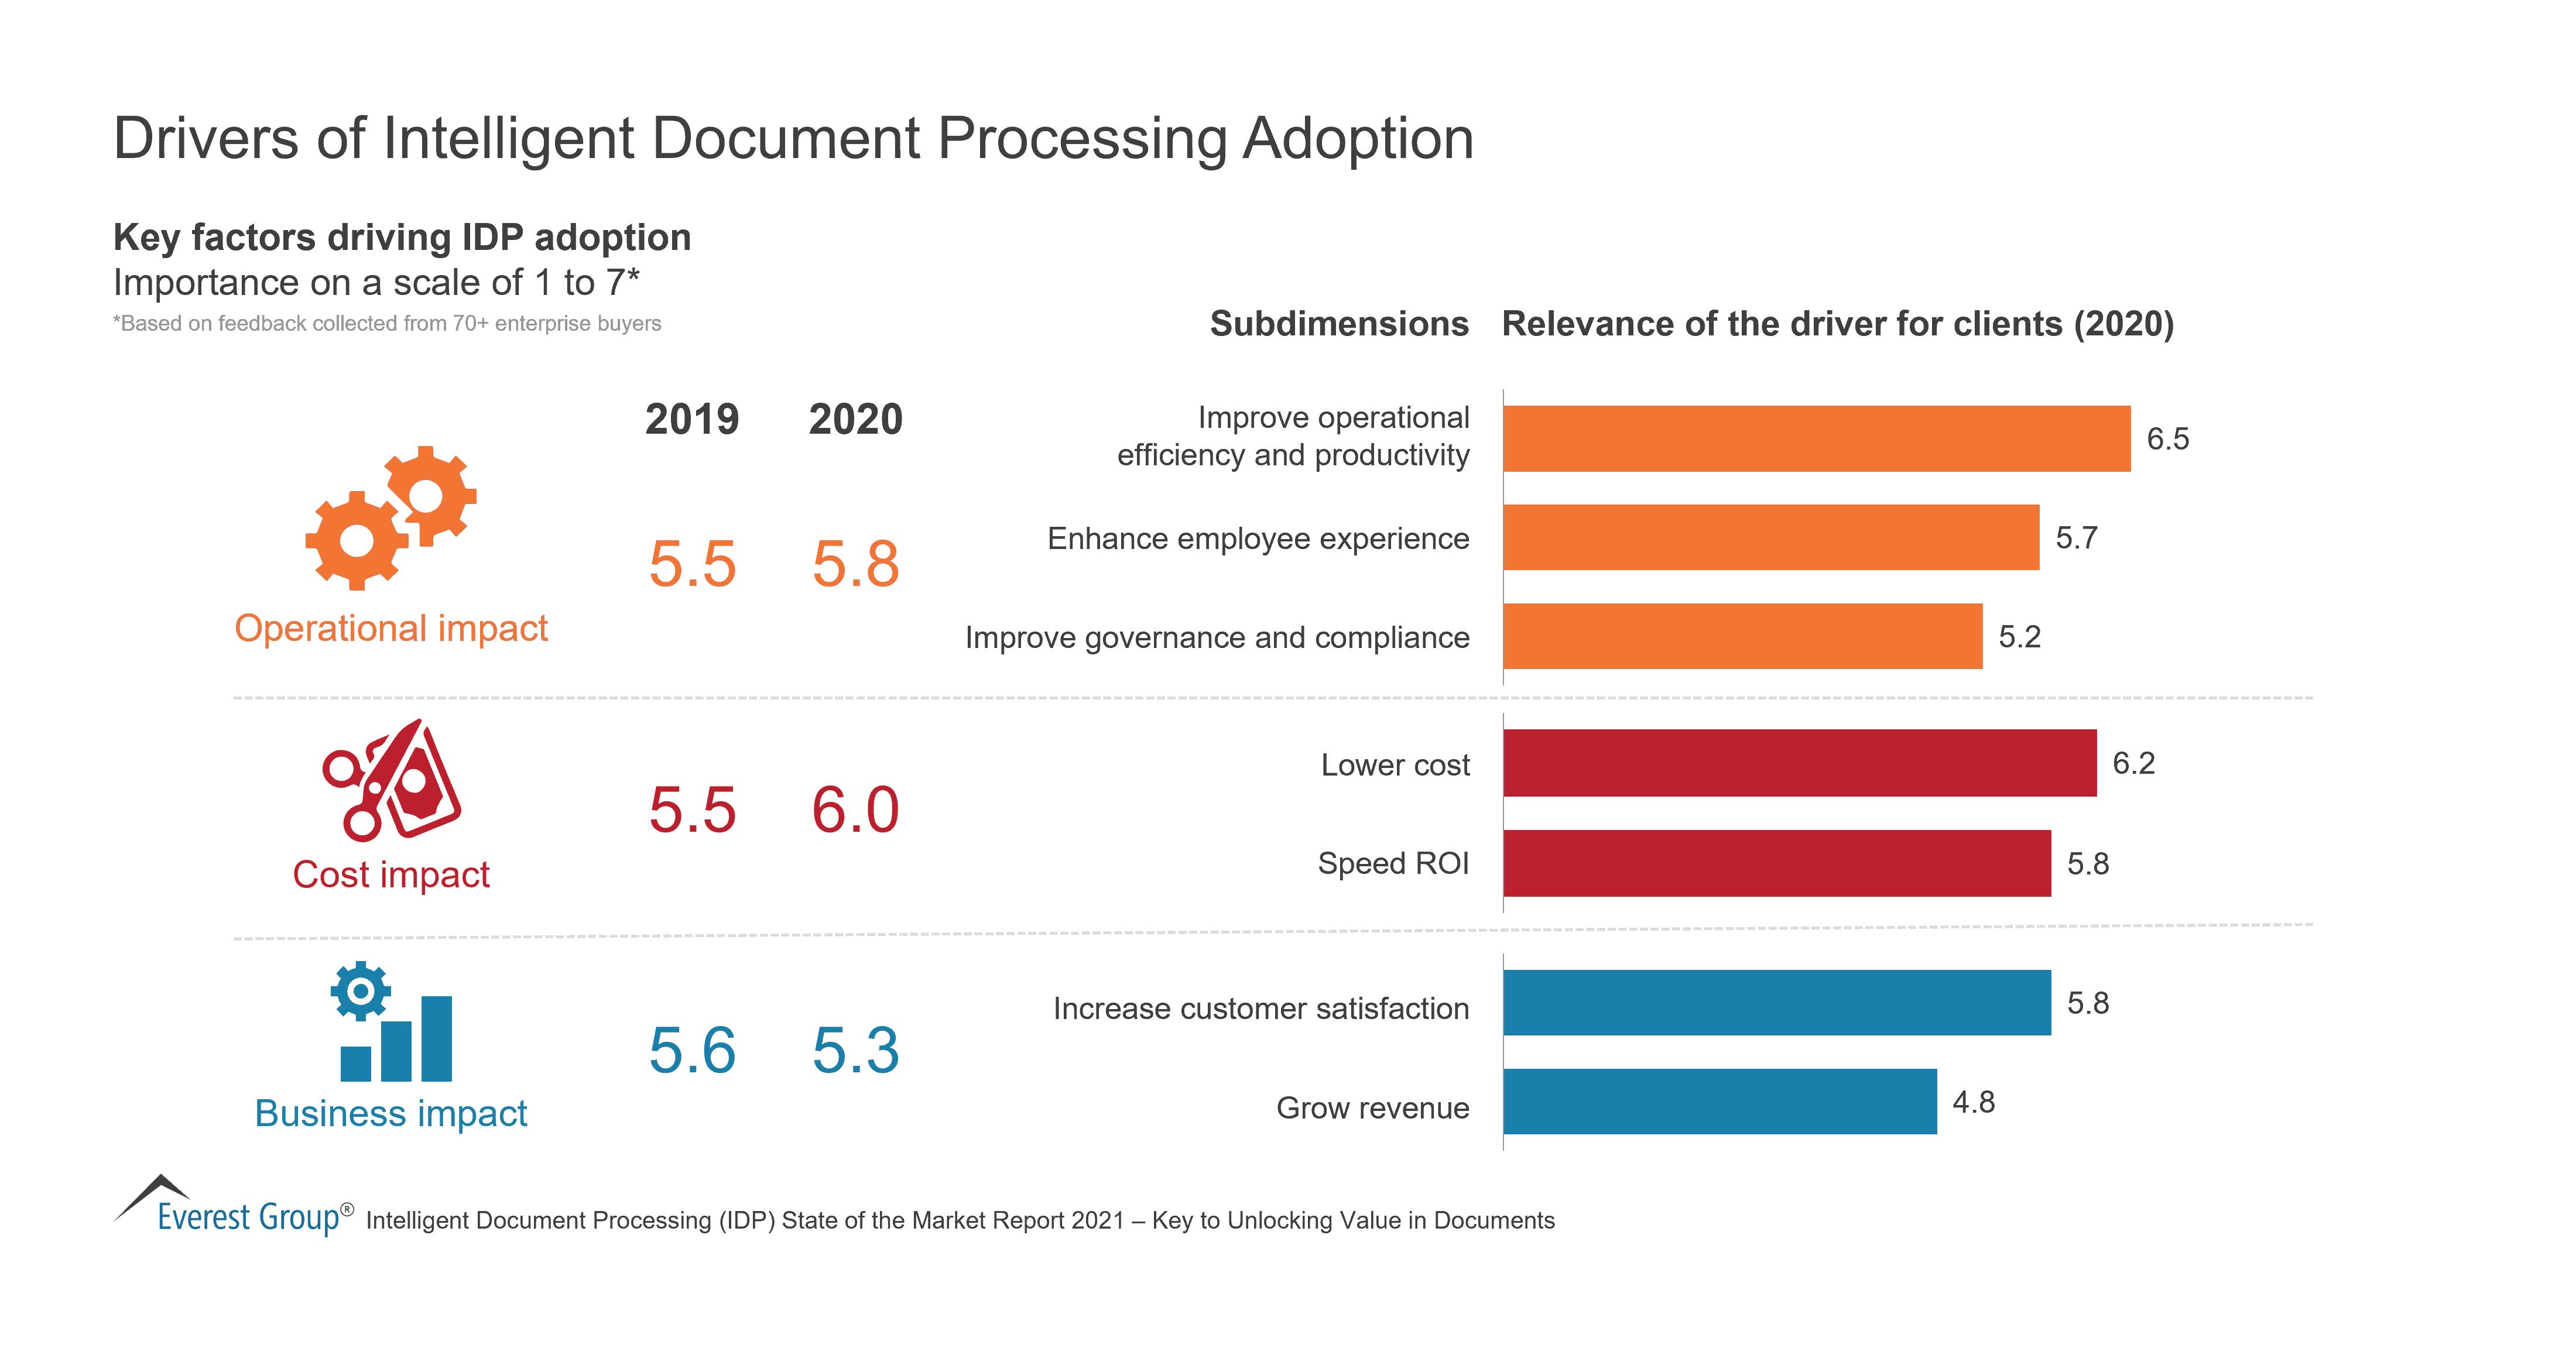 Drivers of Intelligent Document Processing Adoption